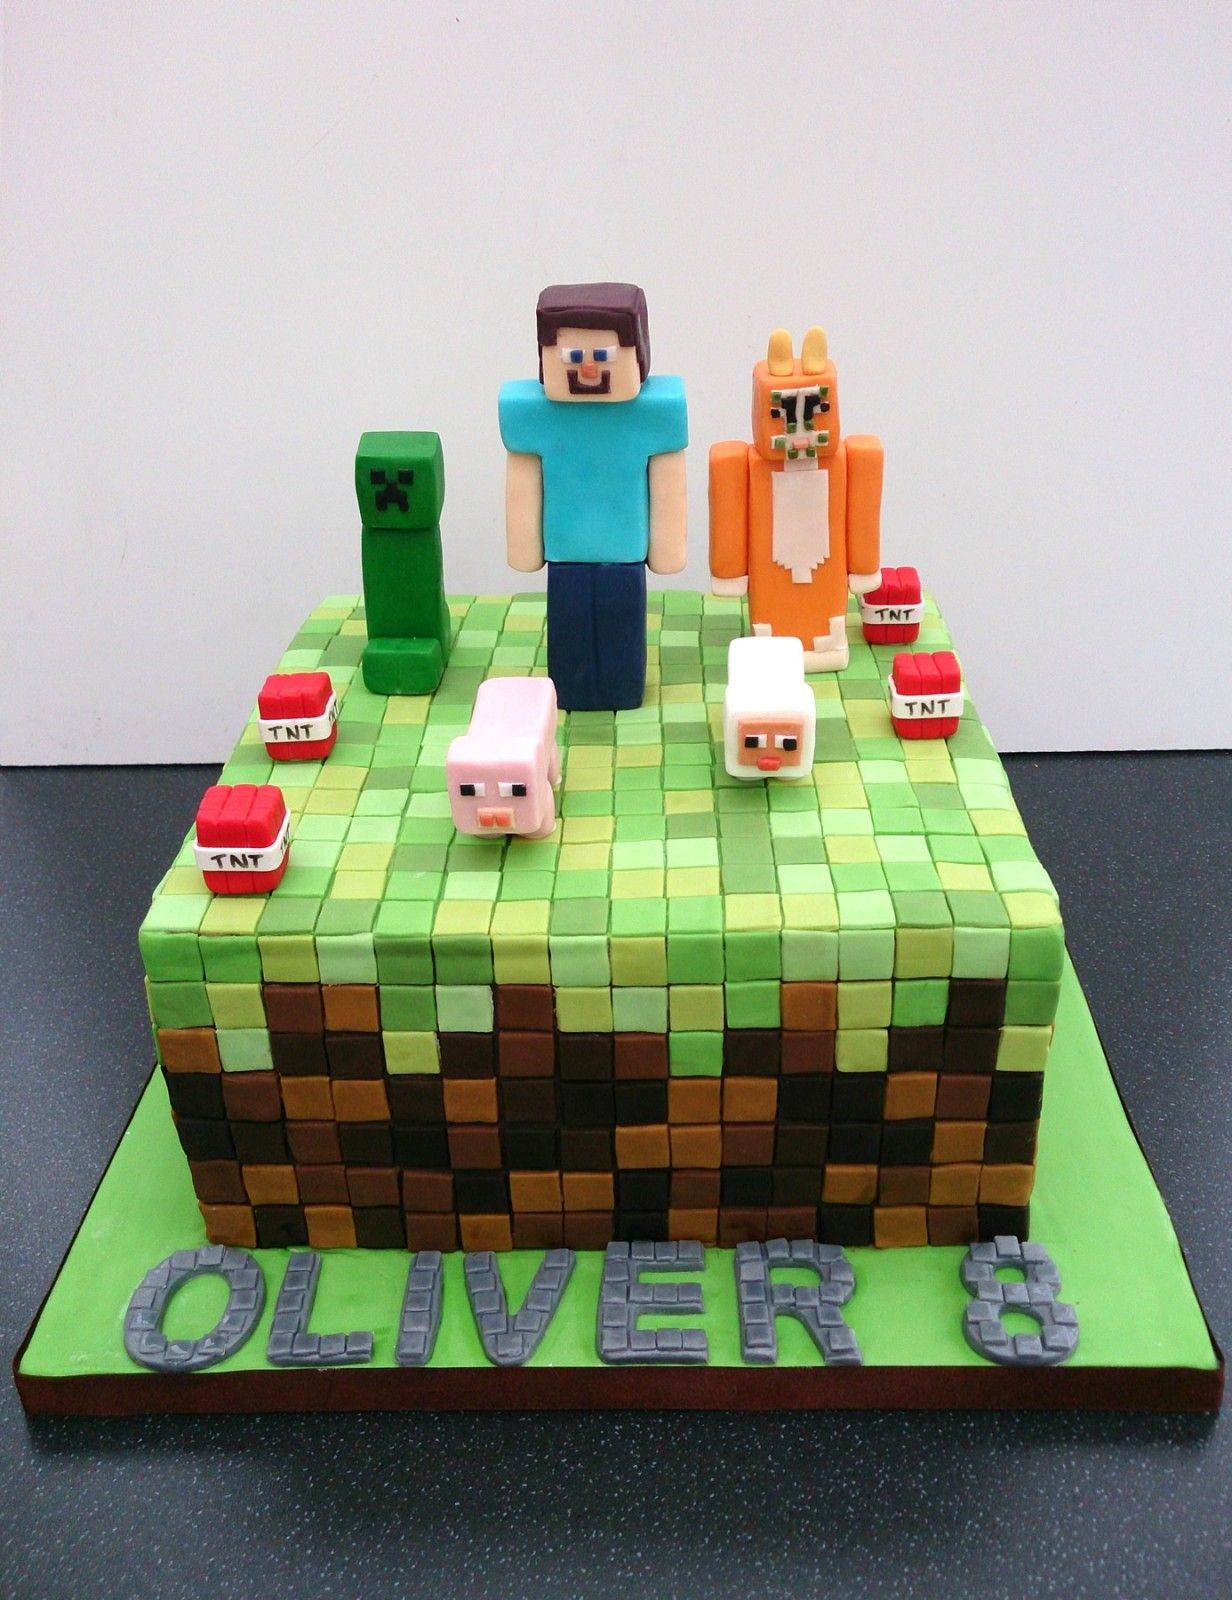 Minecraft Birthday Cake Sponge Poole Dorset Main 1232x1600g 1232